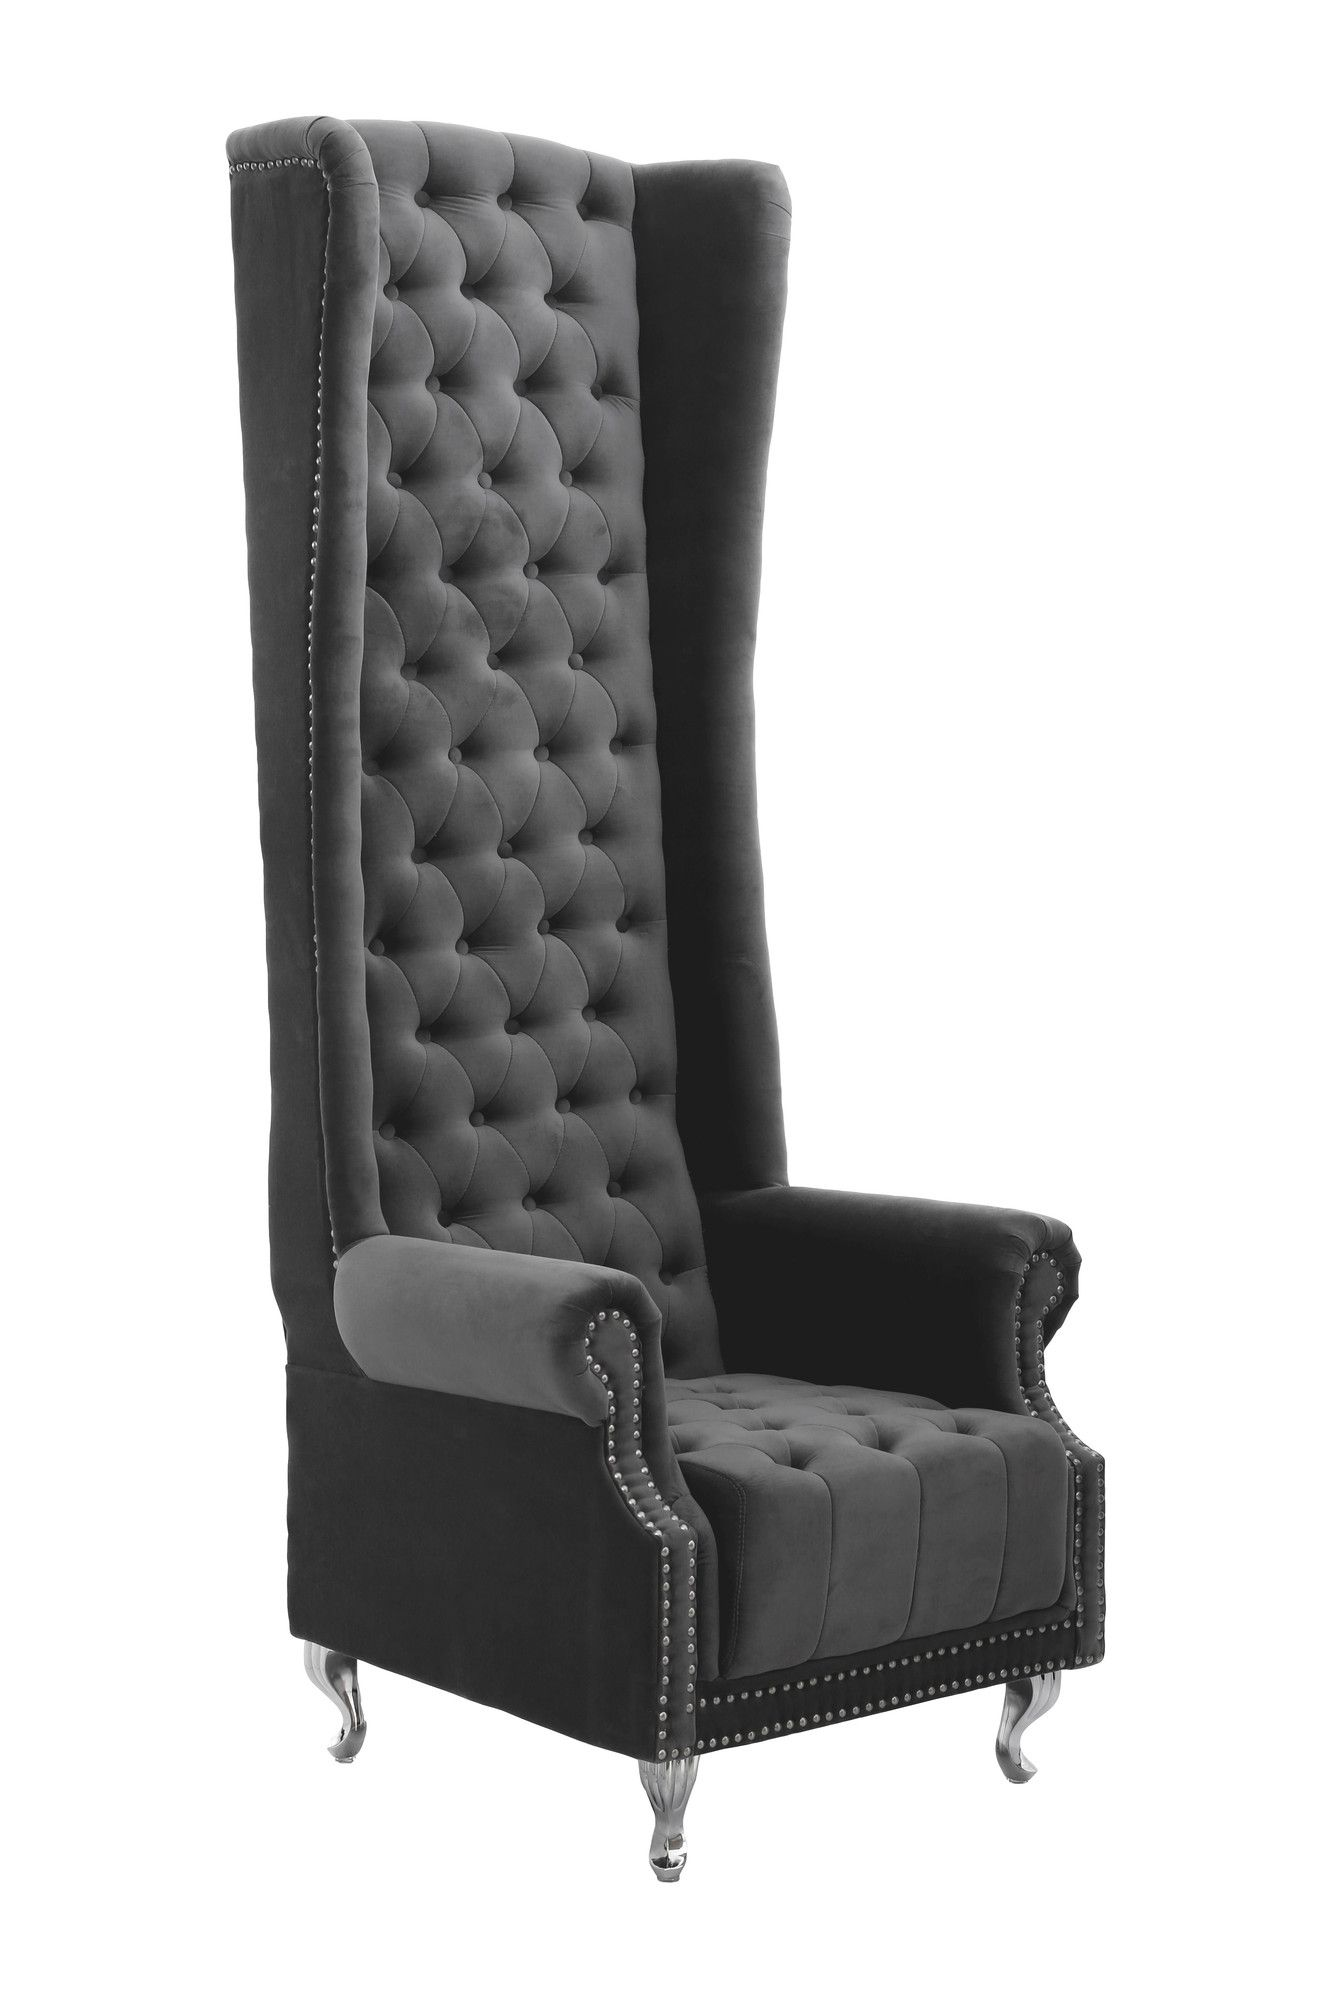 Tall Porter Chair Wayfair Uk Porter Chair Wingback Chair Velvet Wingback Chair